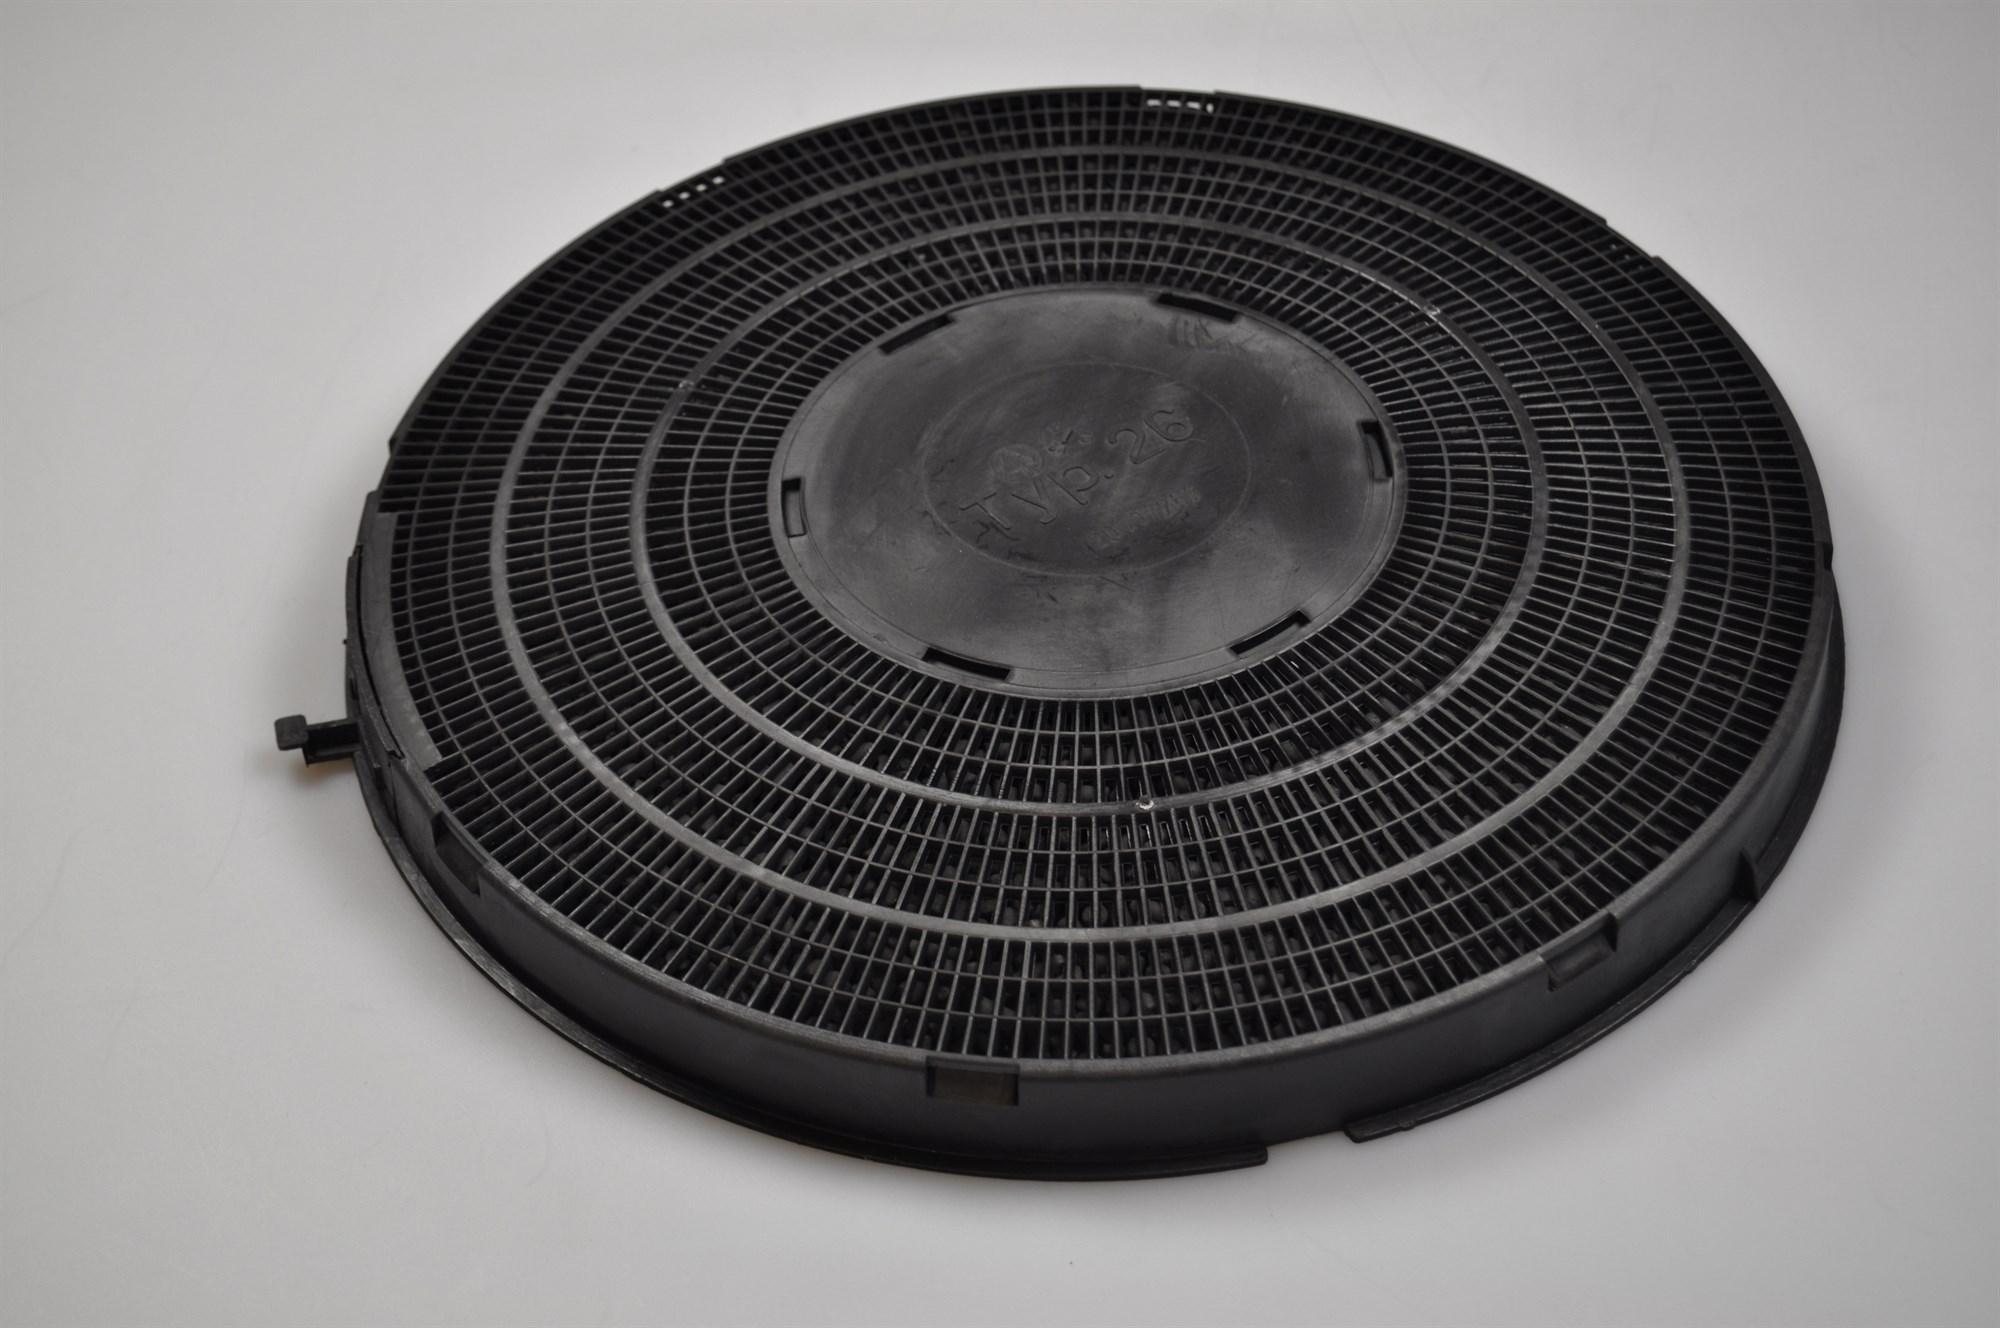 Kohlefilter bauknecht dunstabzugshaube 280 mm